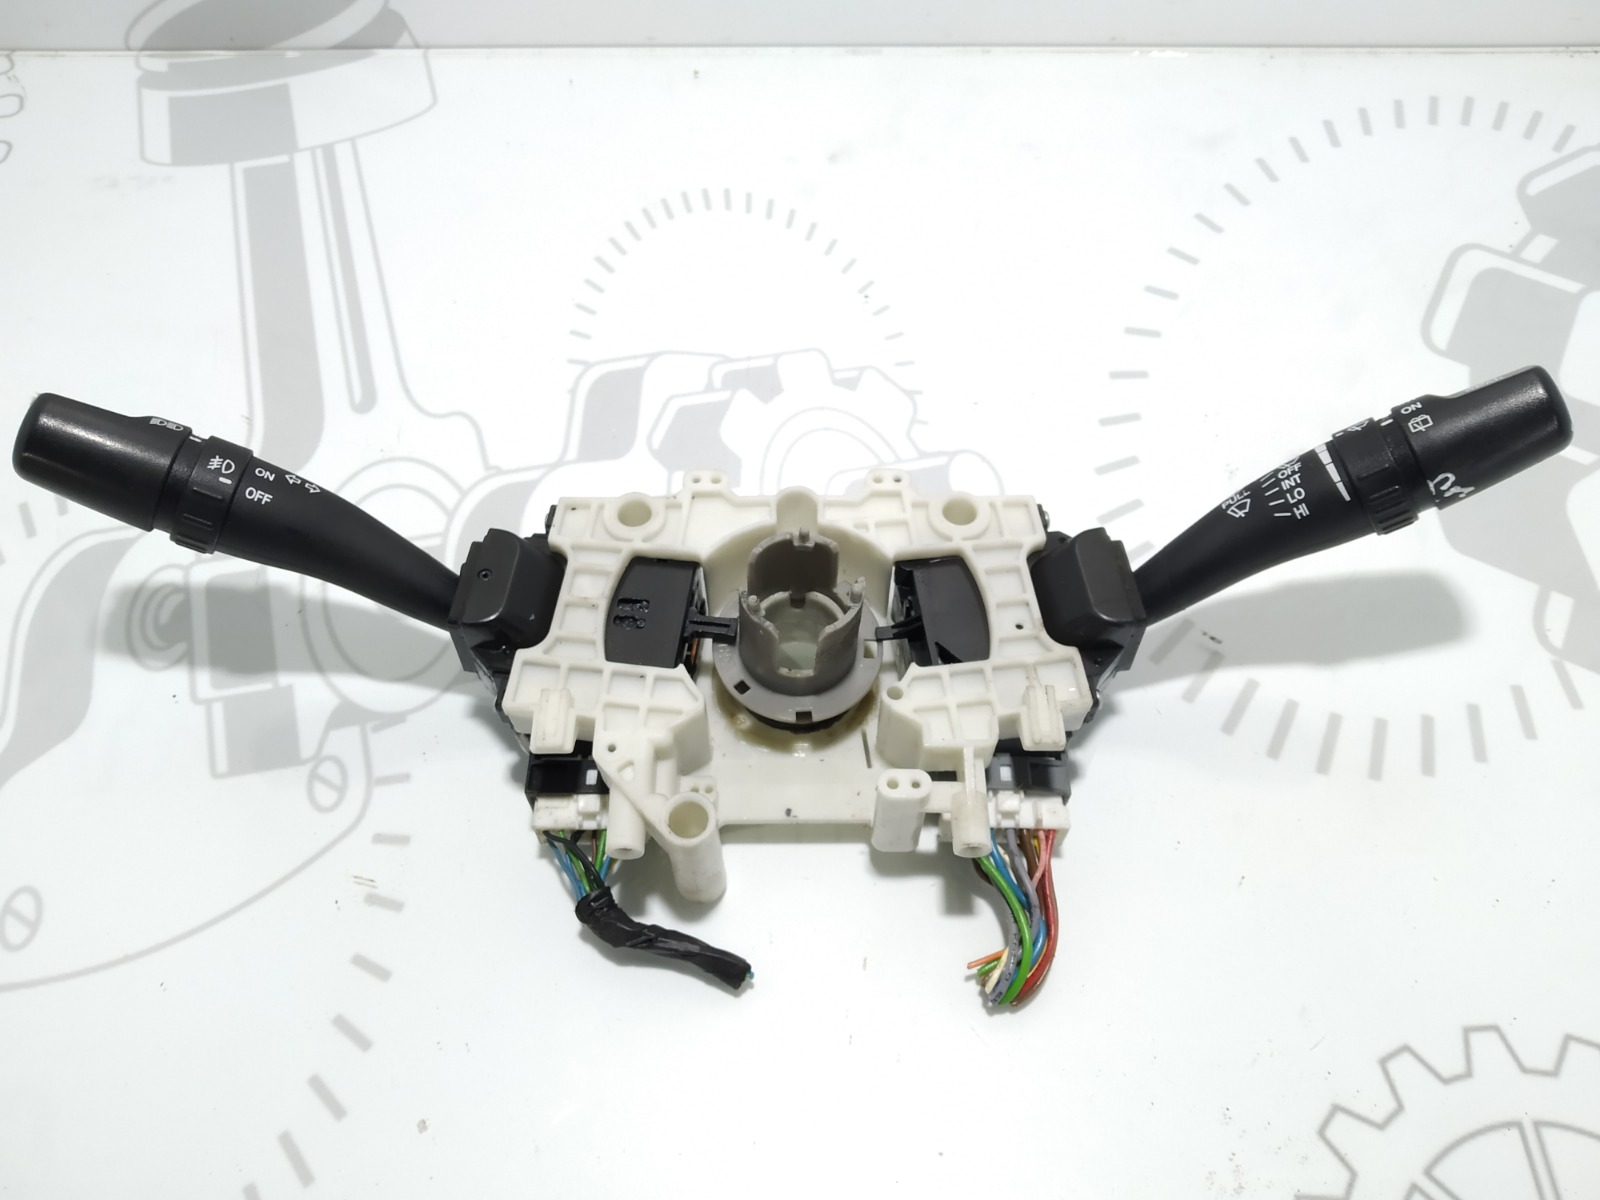 Переключатель подрулевой (стрекоза) Kia Sportage 2.0 CRDI 2009 (б/у)